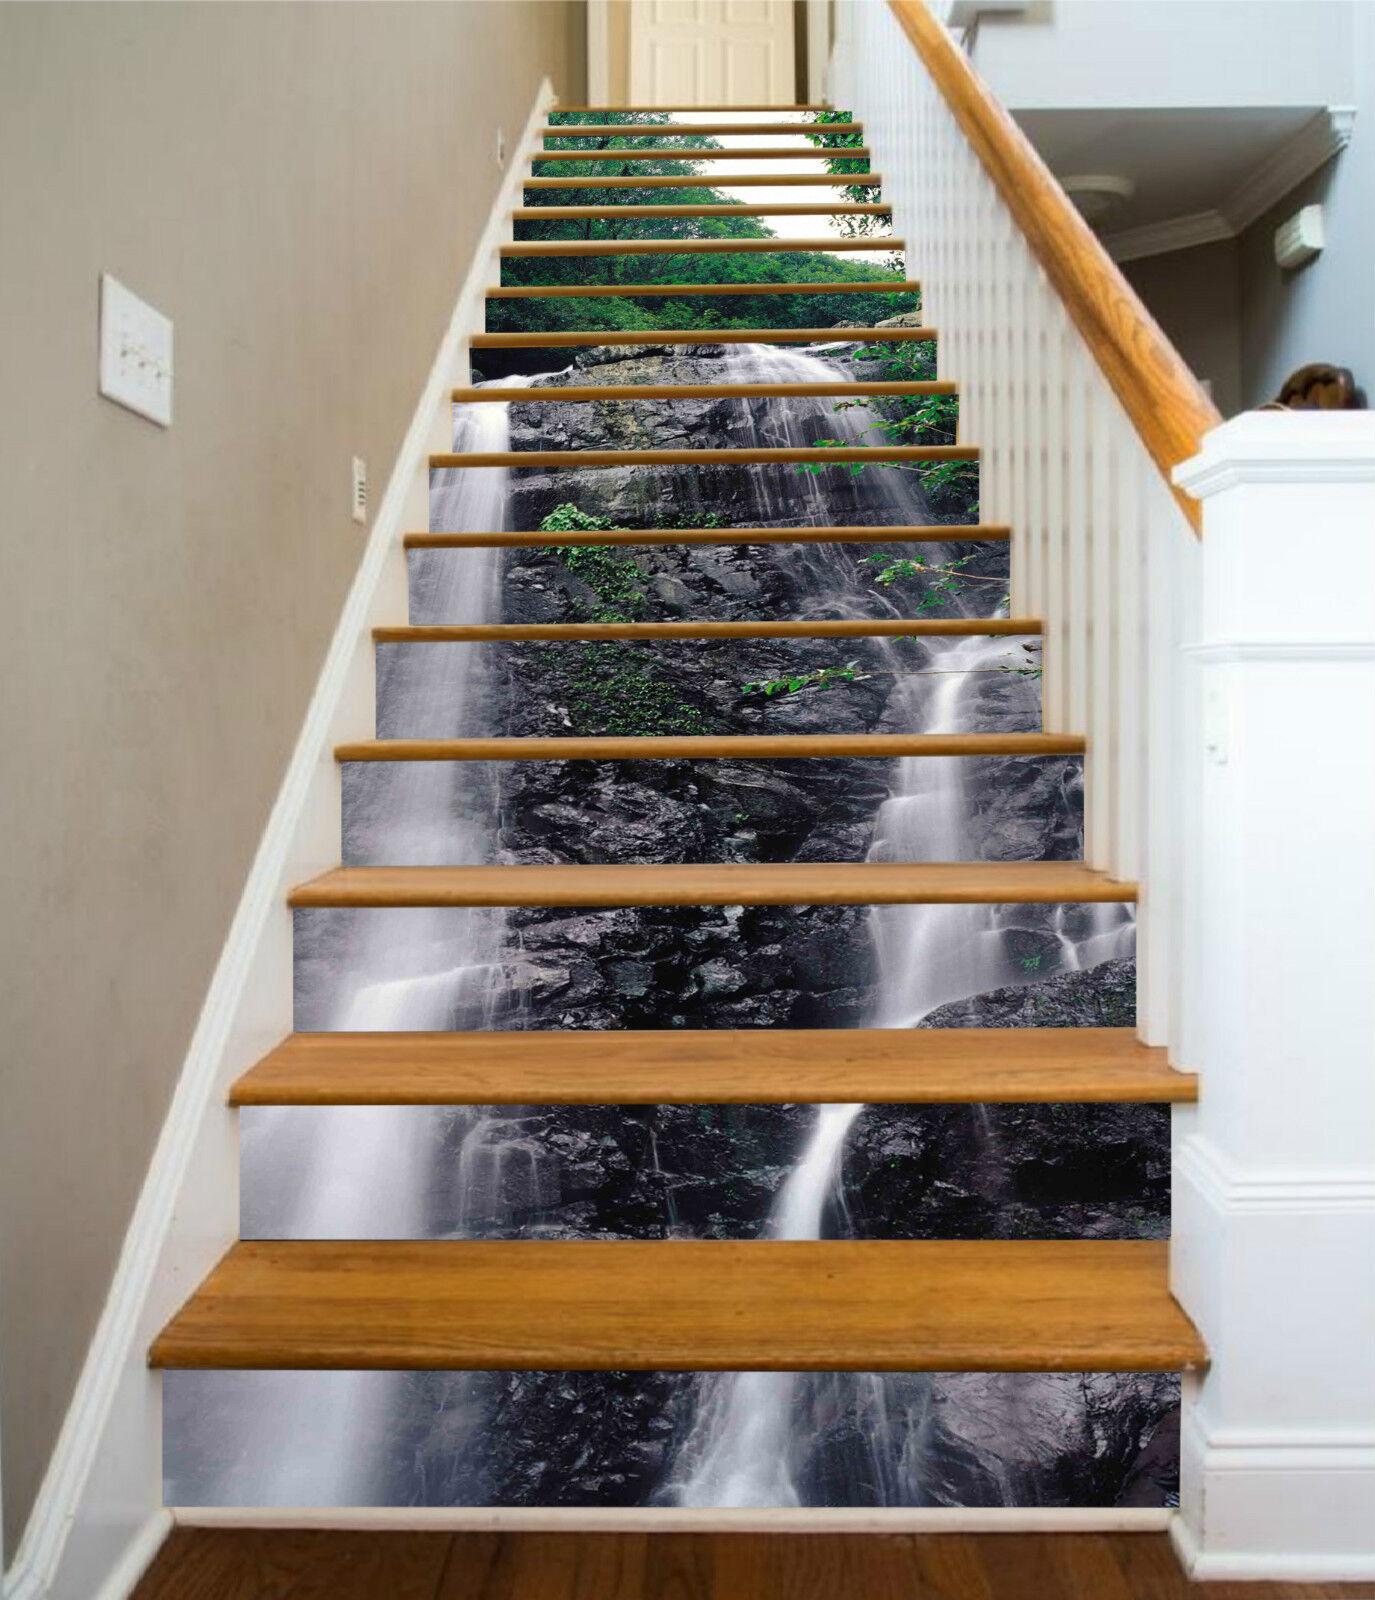 3D Wasserfluss 10 Stair Risers Dekoration Fototapete Vinyl Aufkleber Tapete DE